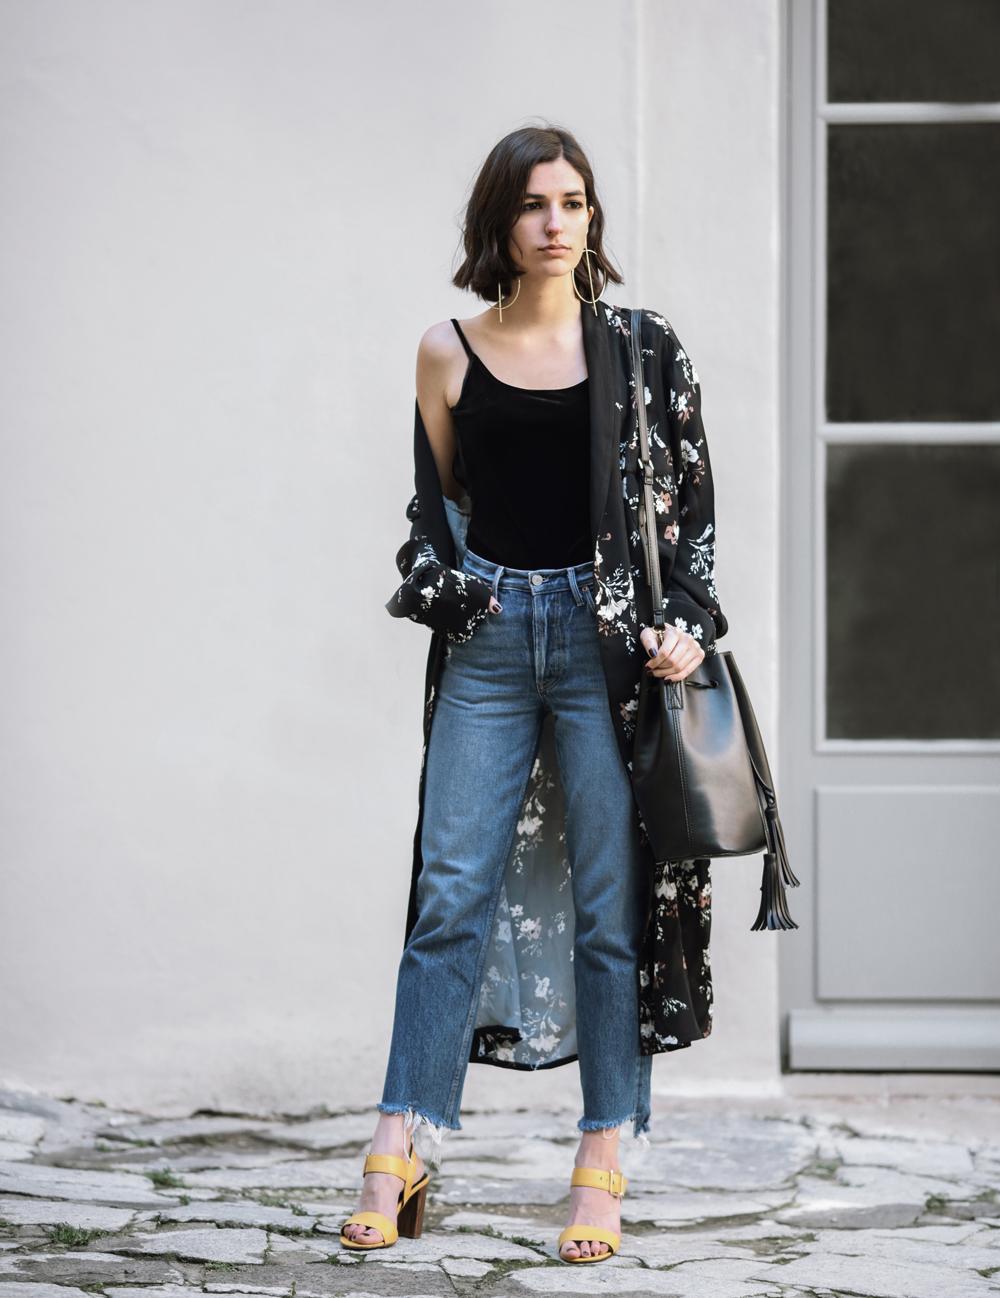 The Kimono Robe Street Style French Fashion Blogger Spring Outfit Mom Jeans Revolve Zara Velvet Top